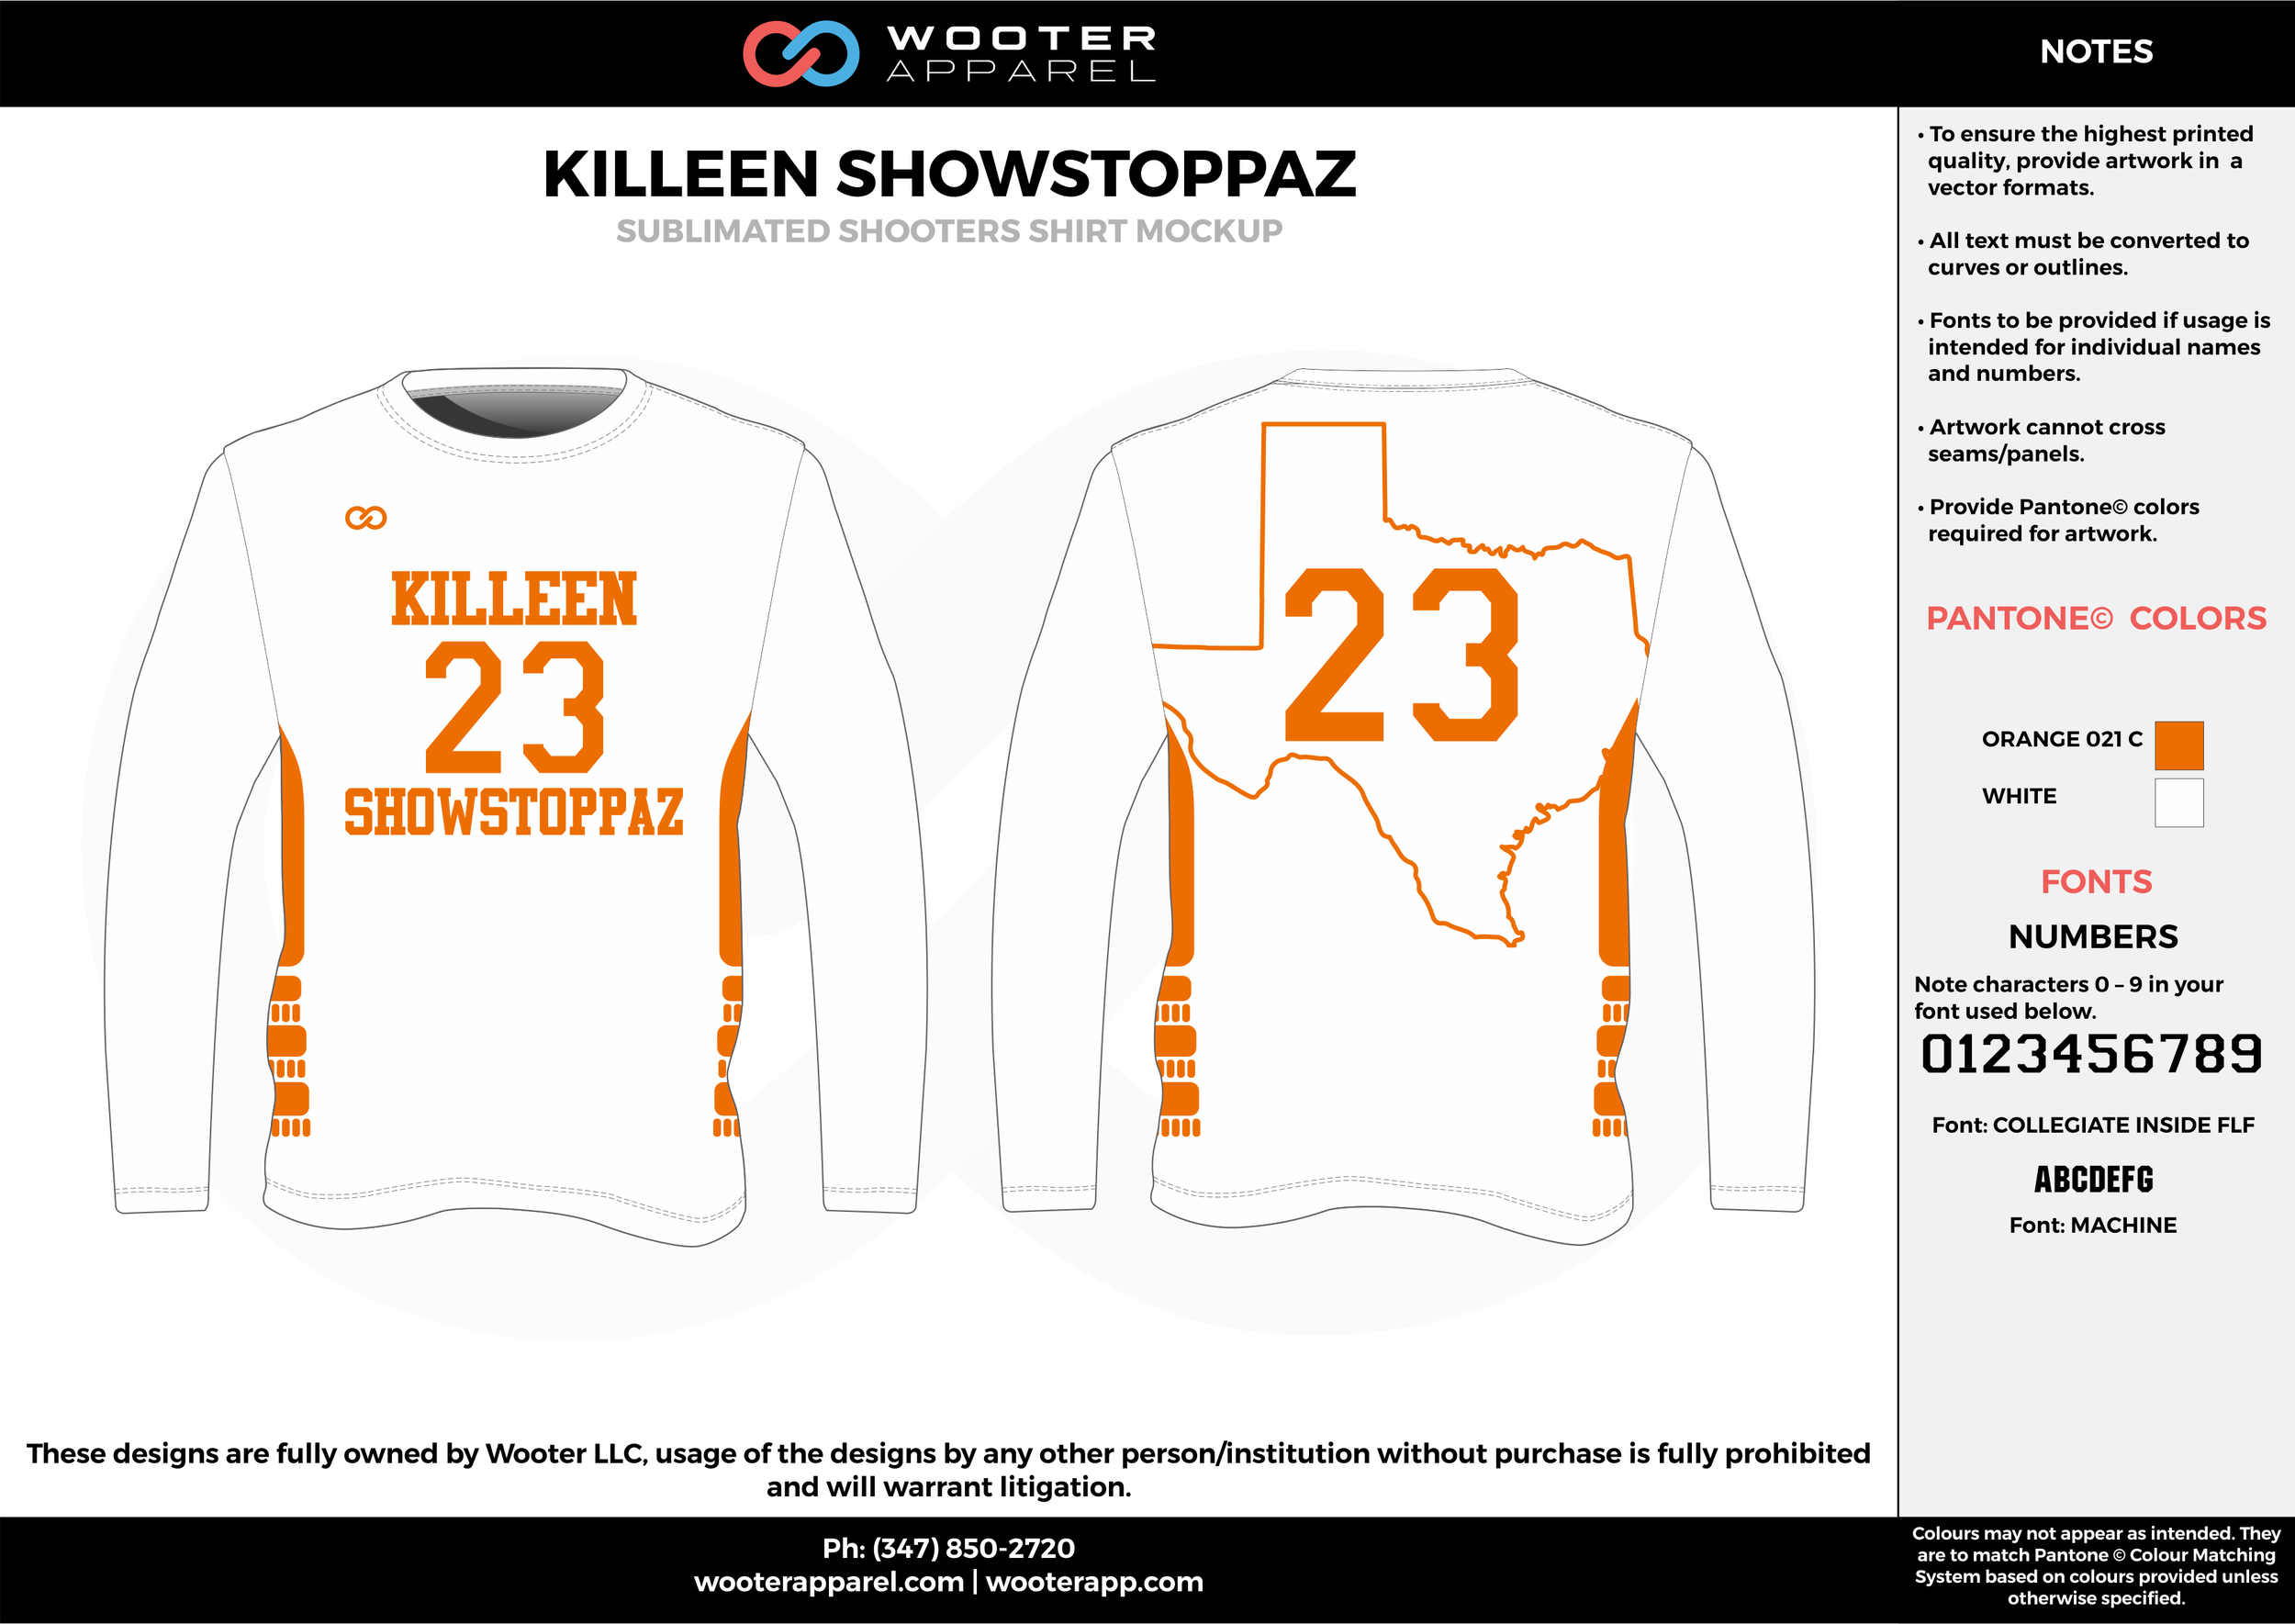 KILLEN SHOWSTOPPAZ orange white Basketball Long Sleeve Shooting Shirt